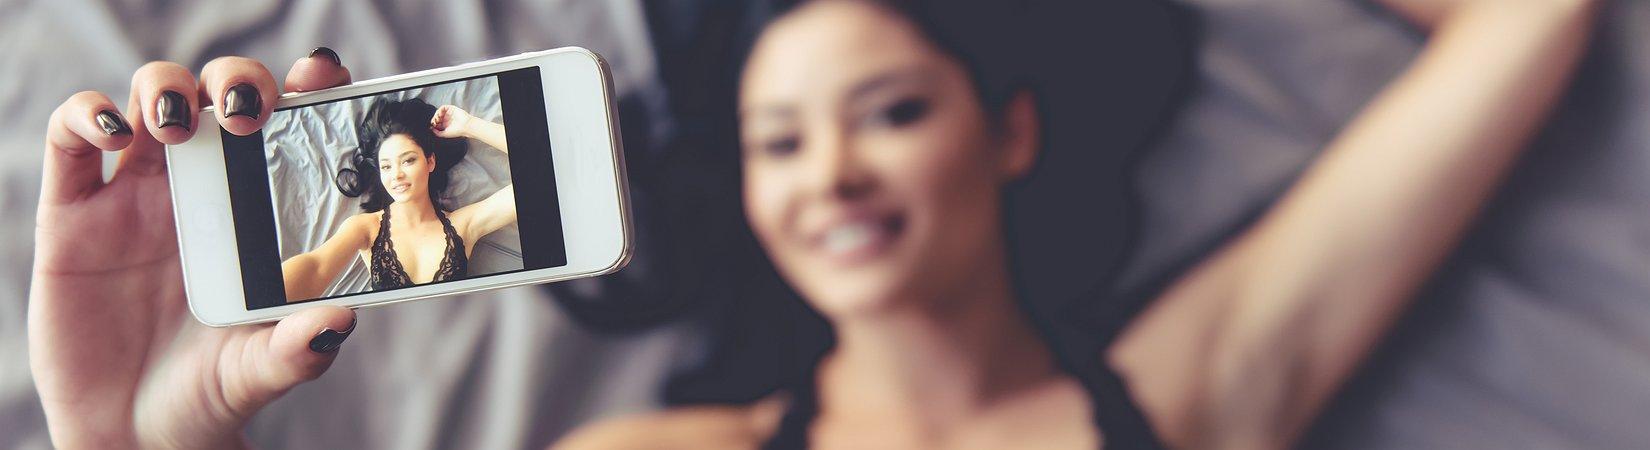 Snapchat procura se distanciar de conteúdo sexual